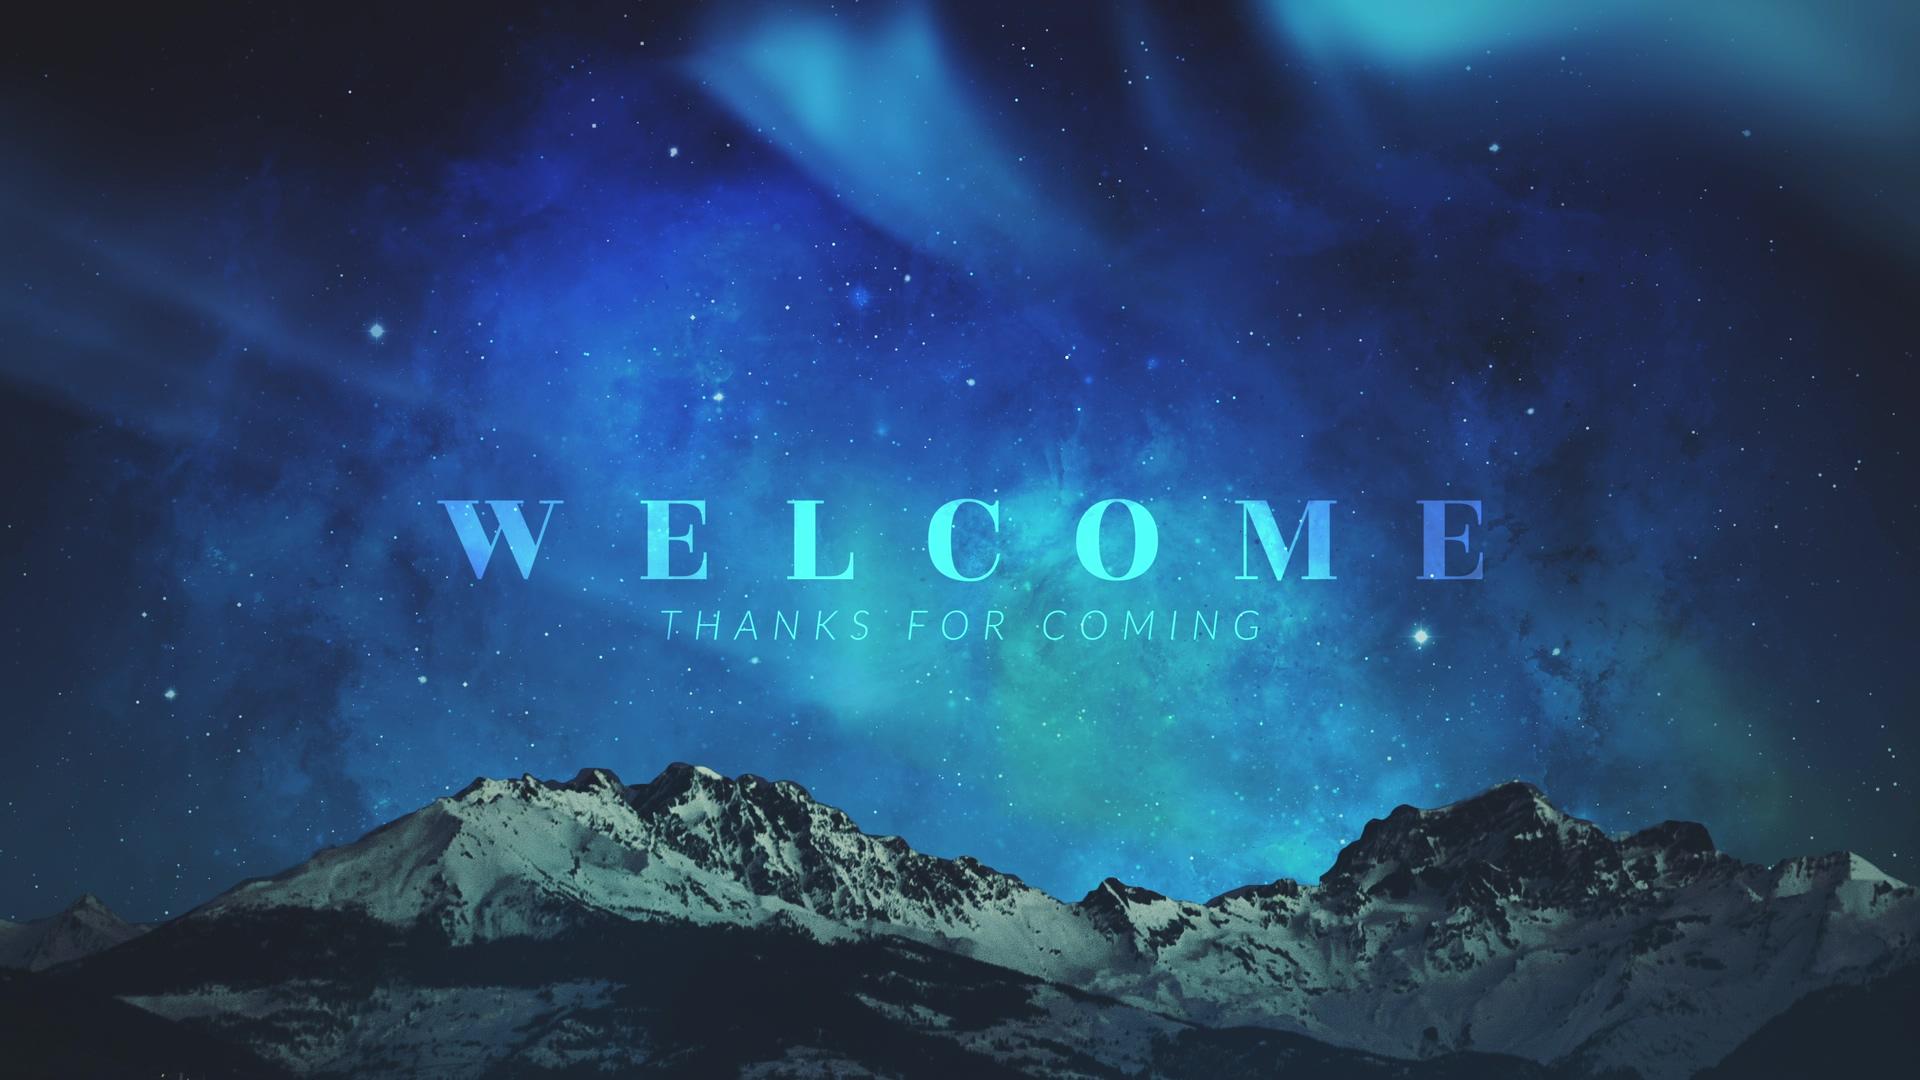 heavenly-lights-welcome-still-hd.jpg